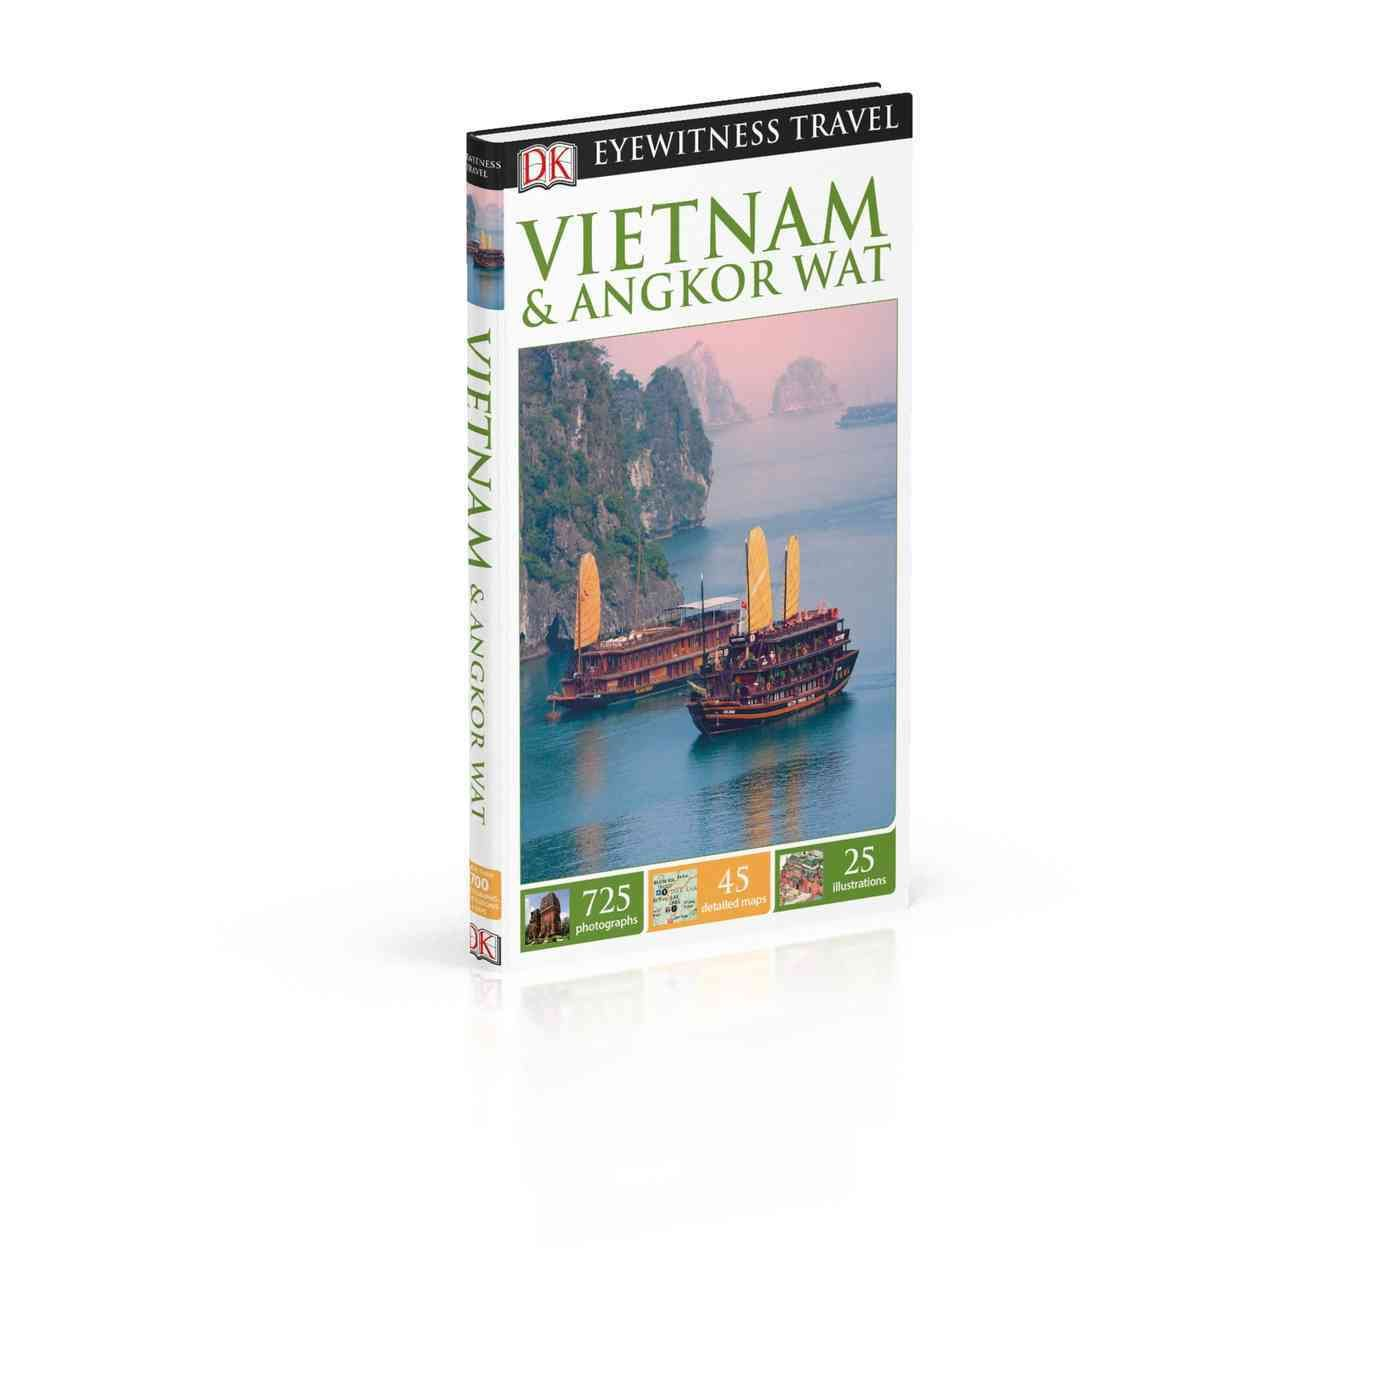 DK Eyewitness Travel Vietnam & Angkor Wat